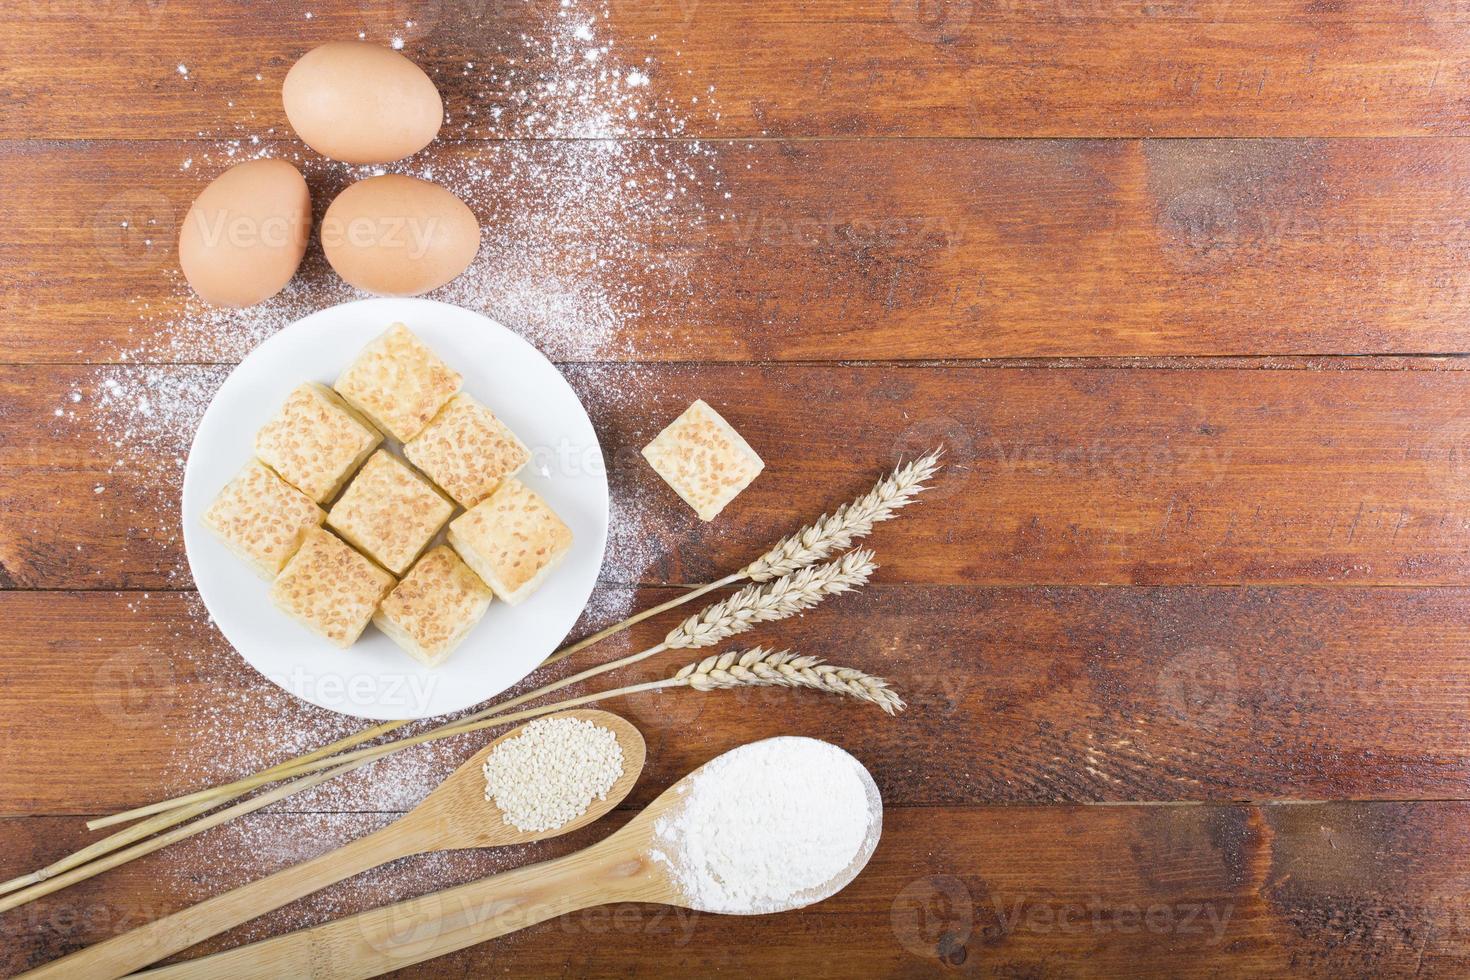 recept ingrediënten en keuken foto